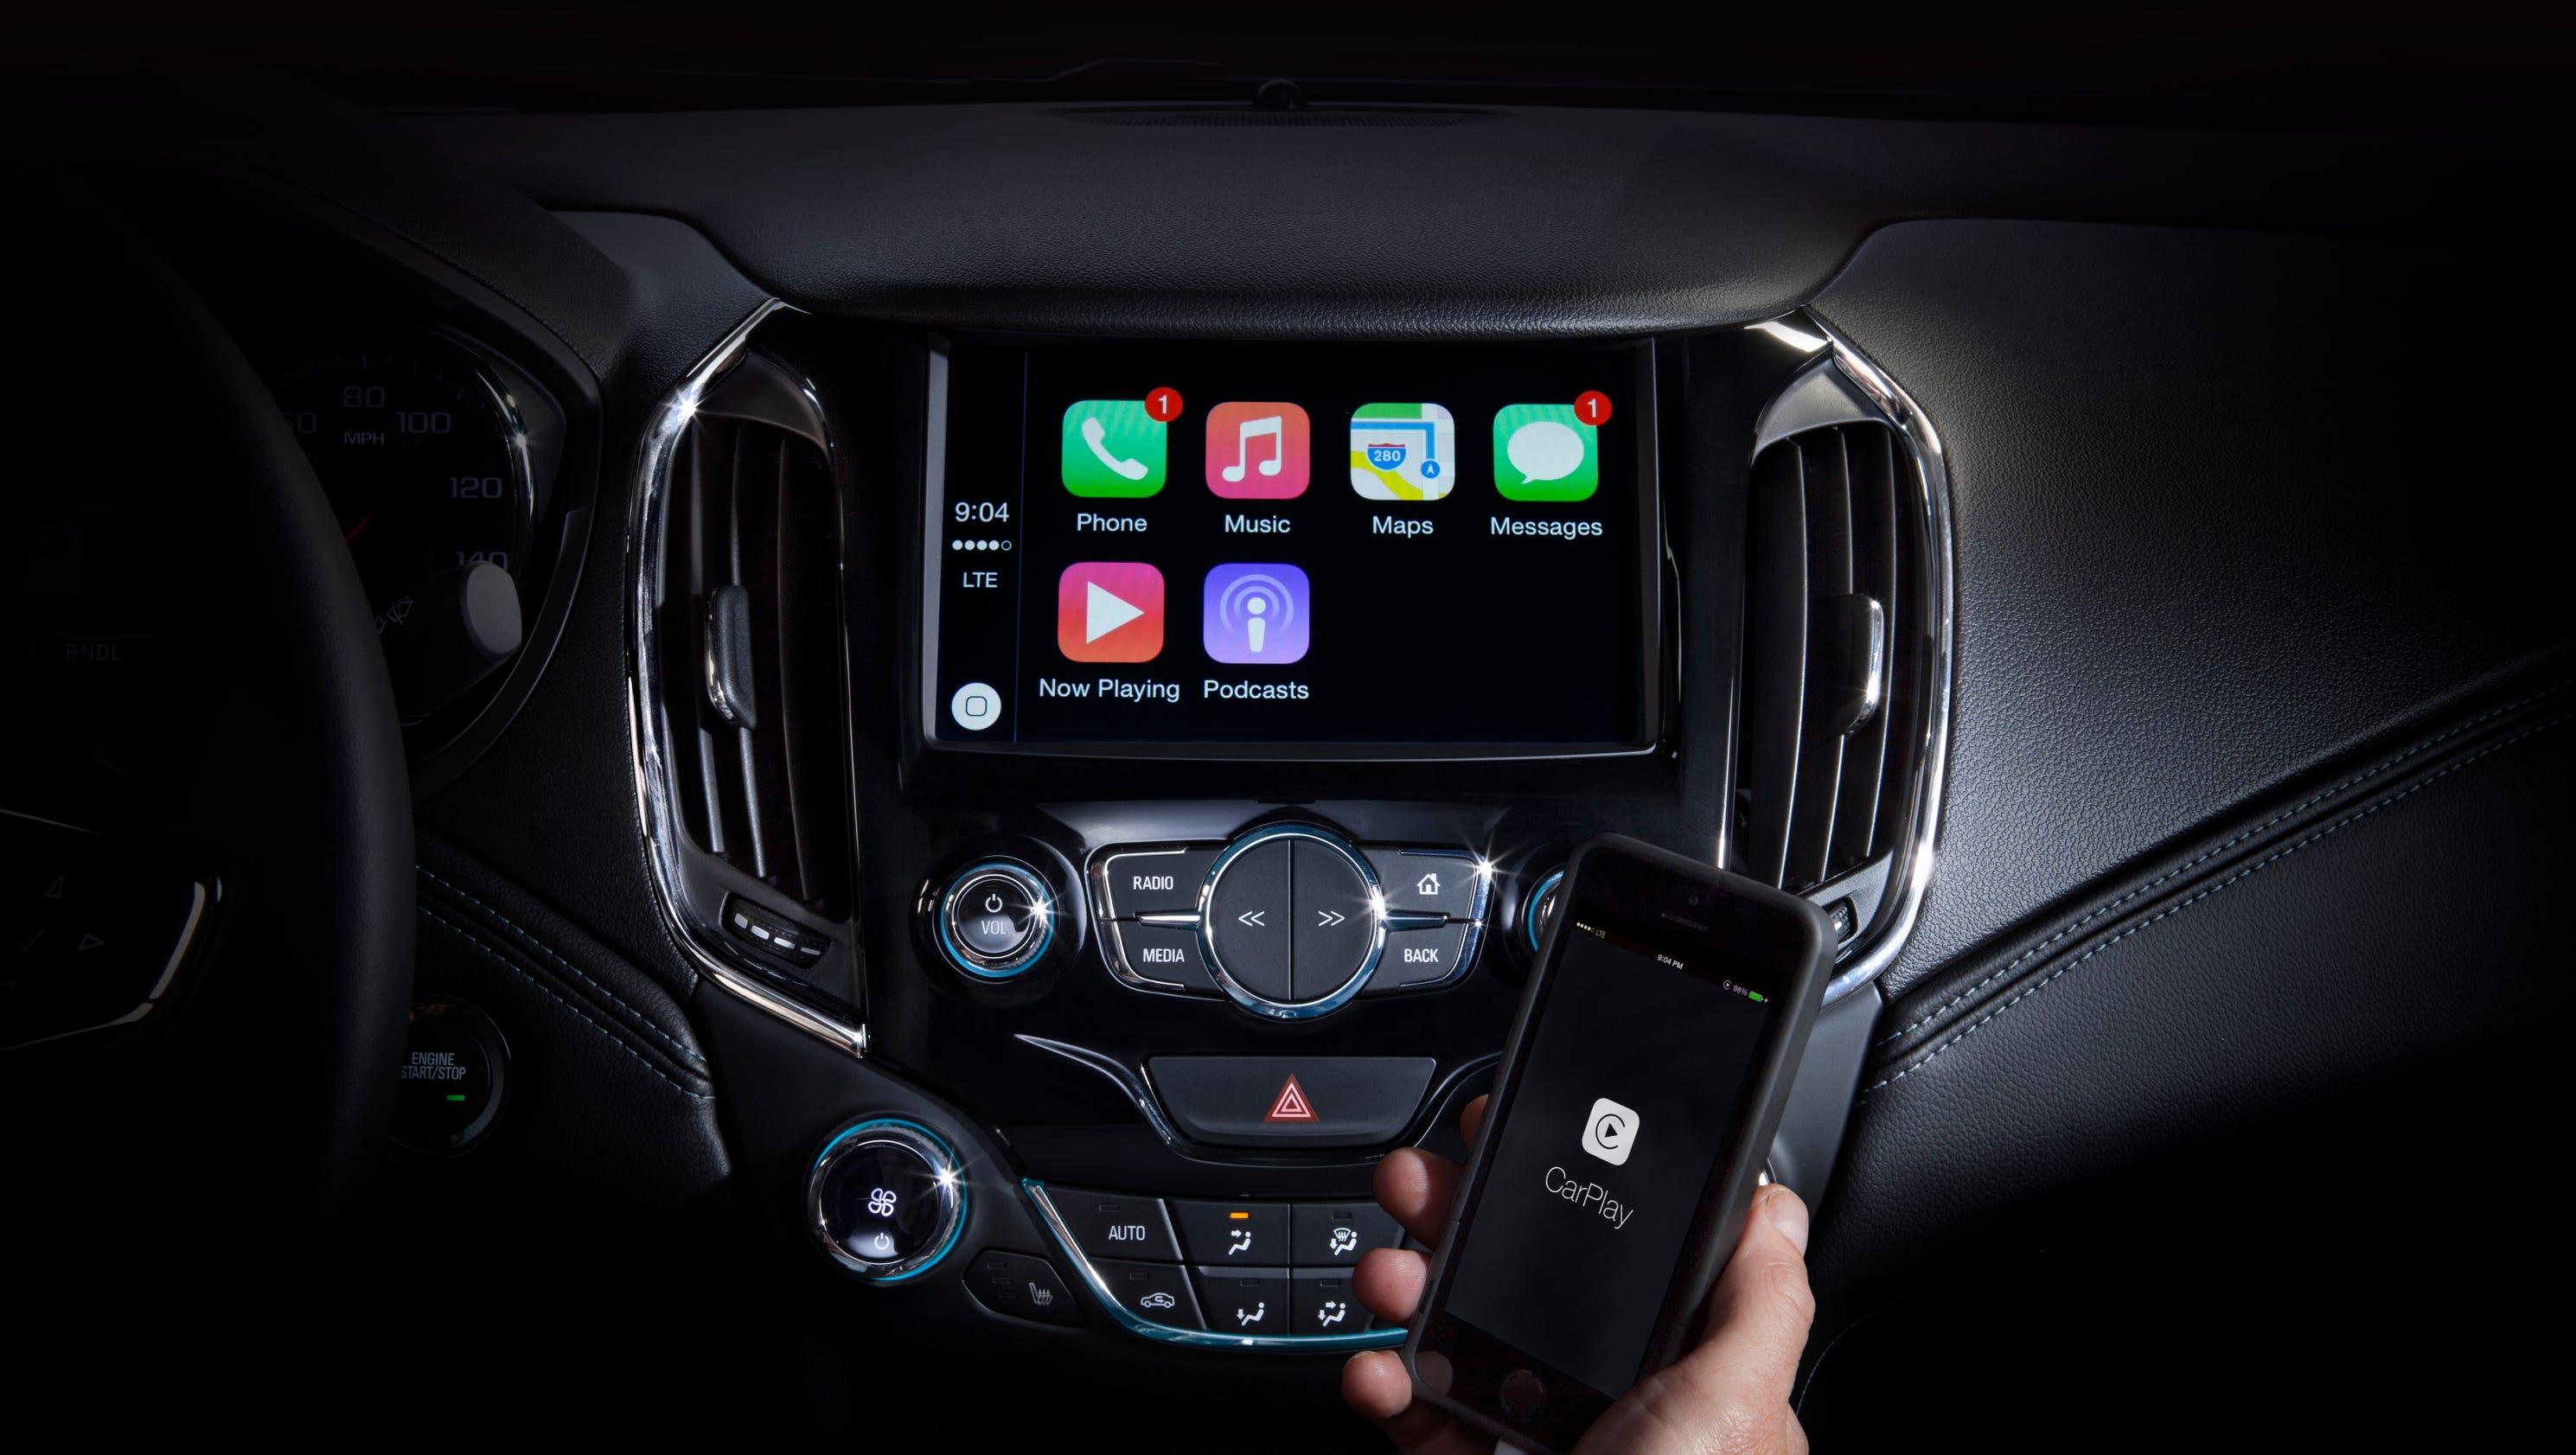 Fiat Chrysler embraces Apple CarPlay, Android Auto